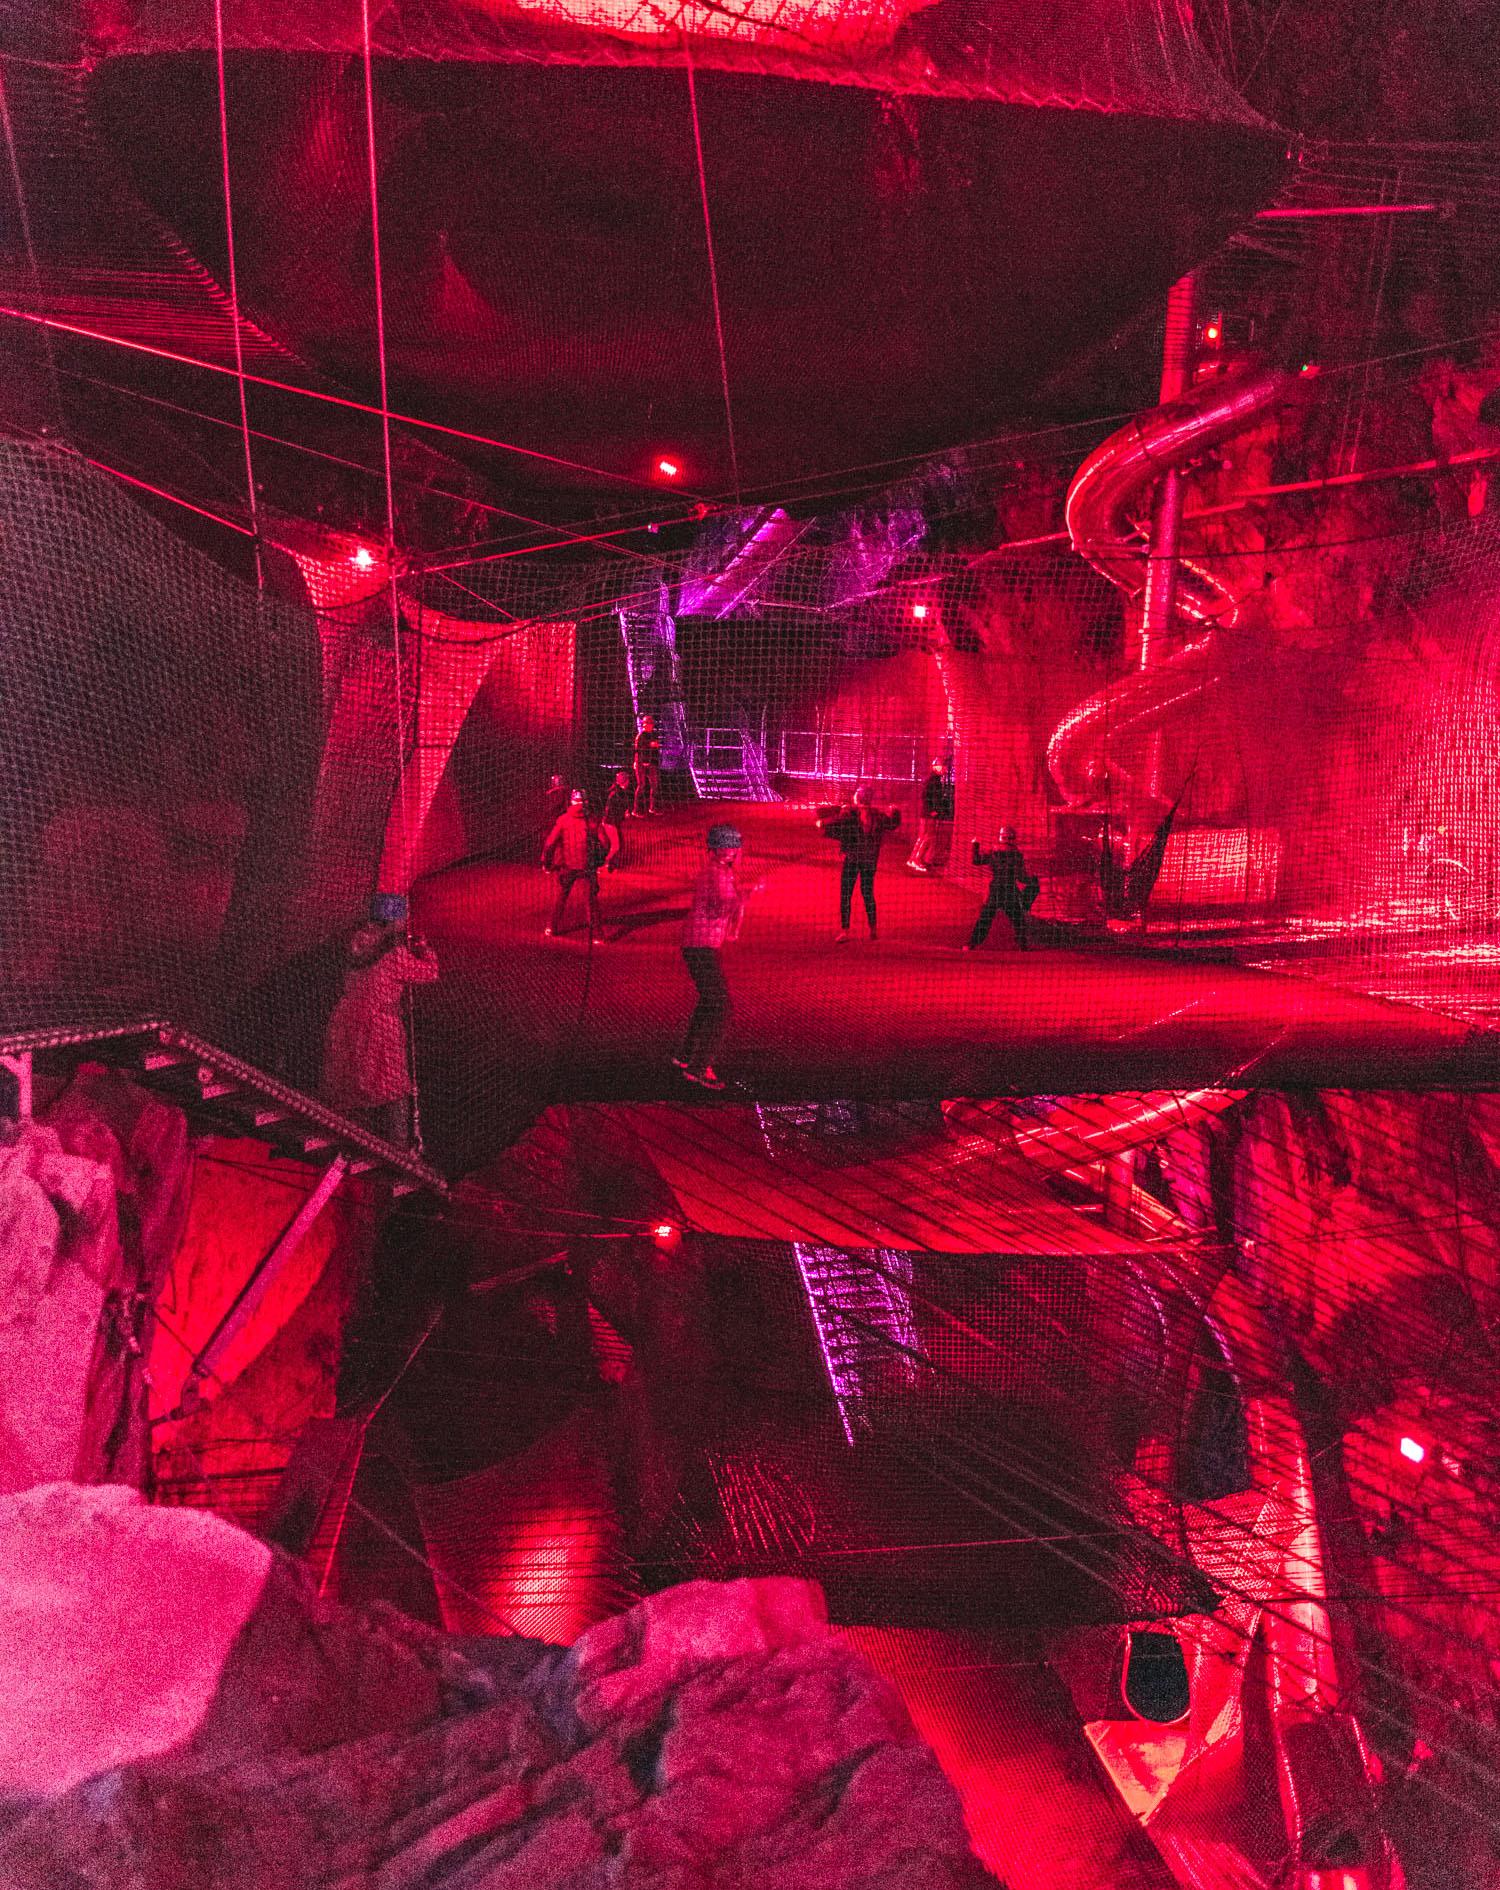 Bounce Below - Underground Trampolines in North Wales